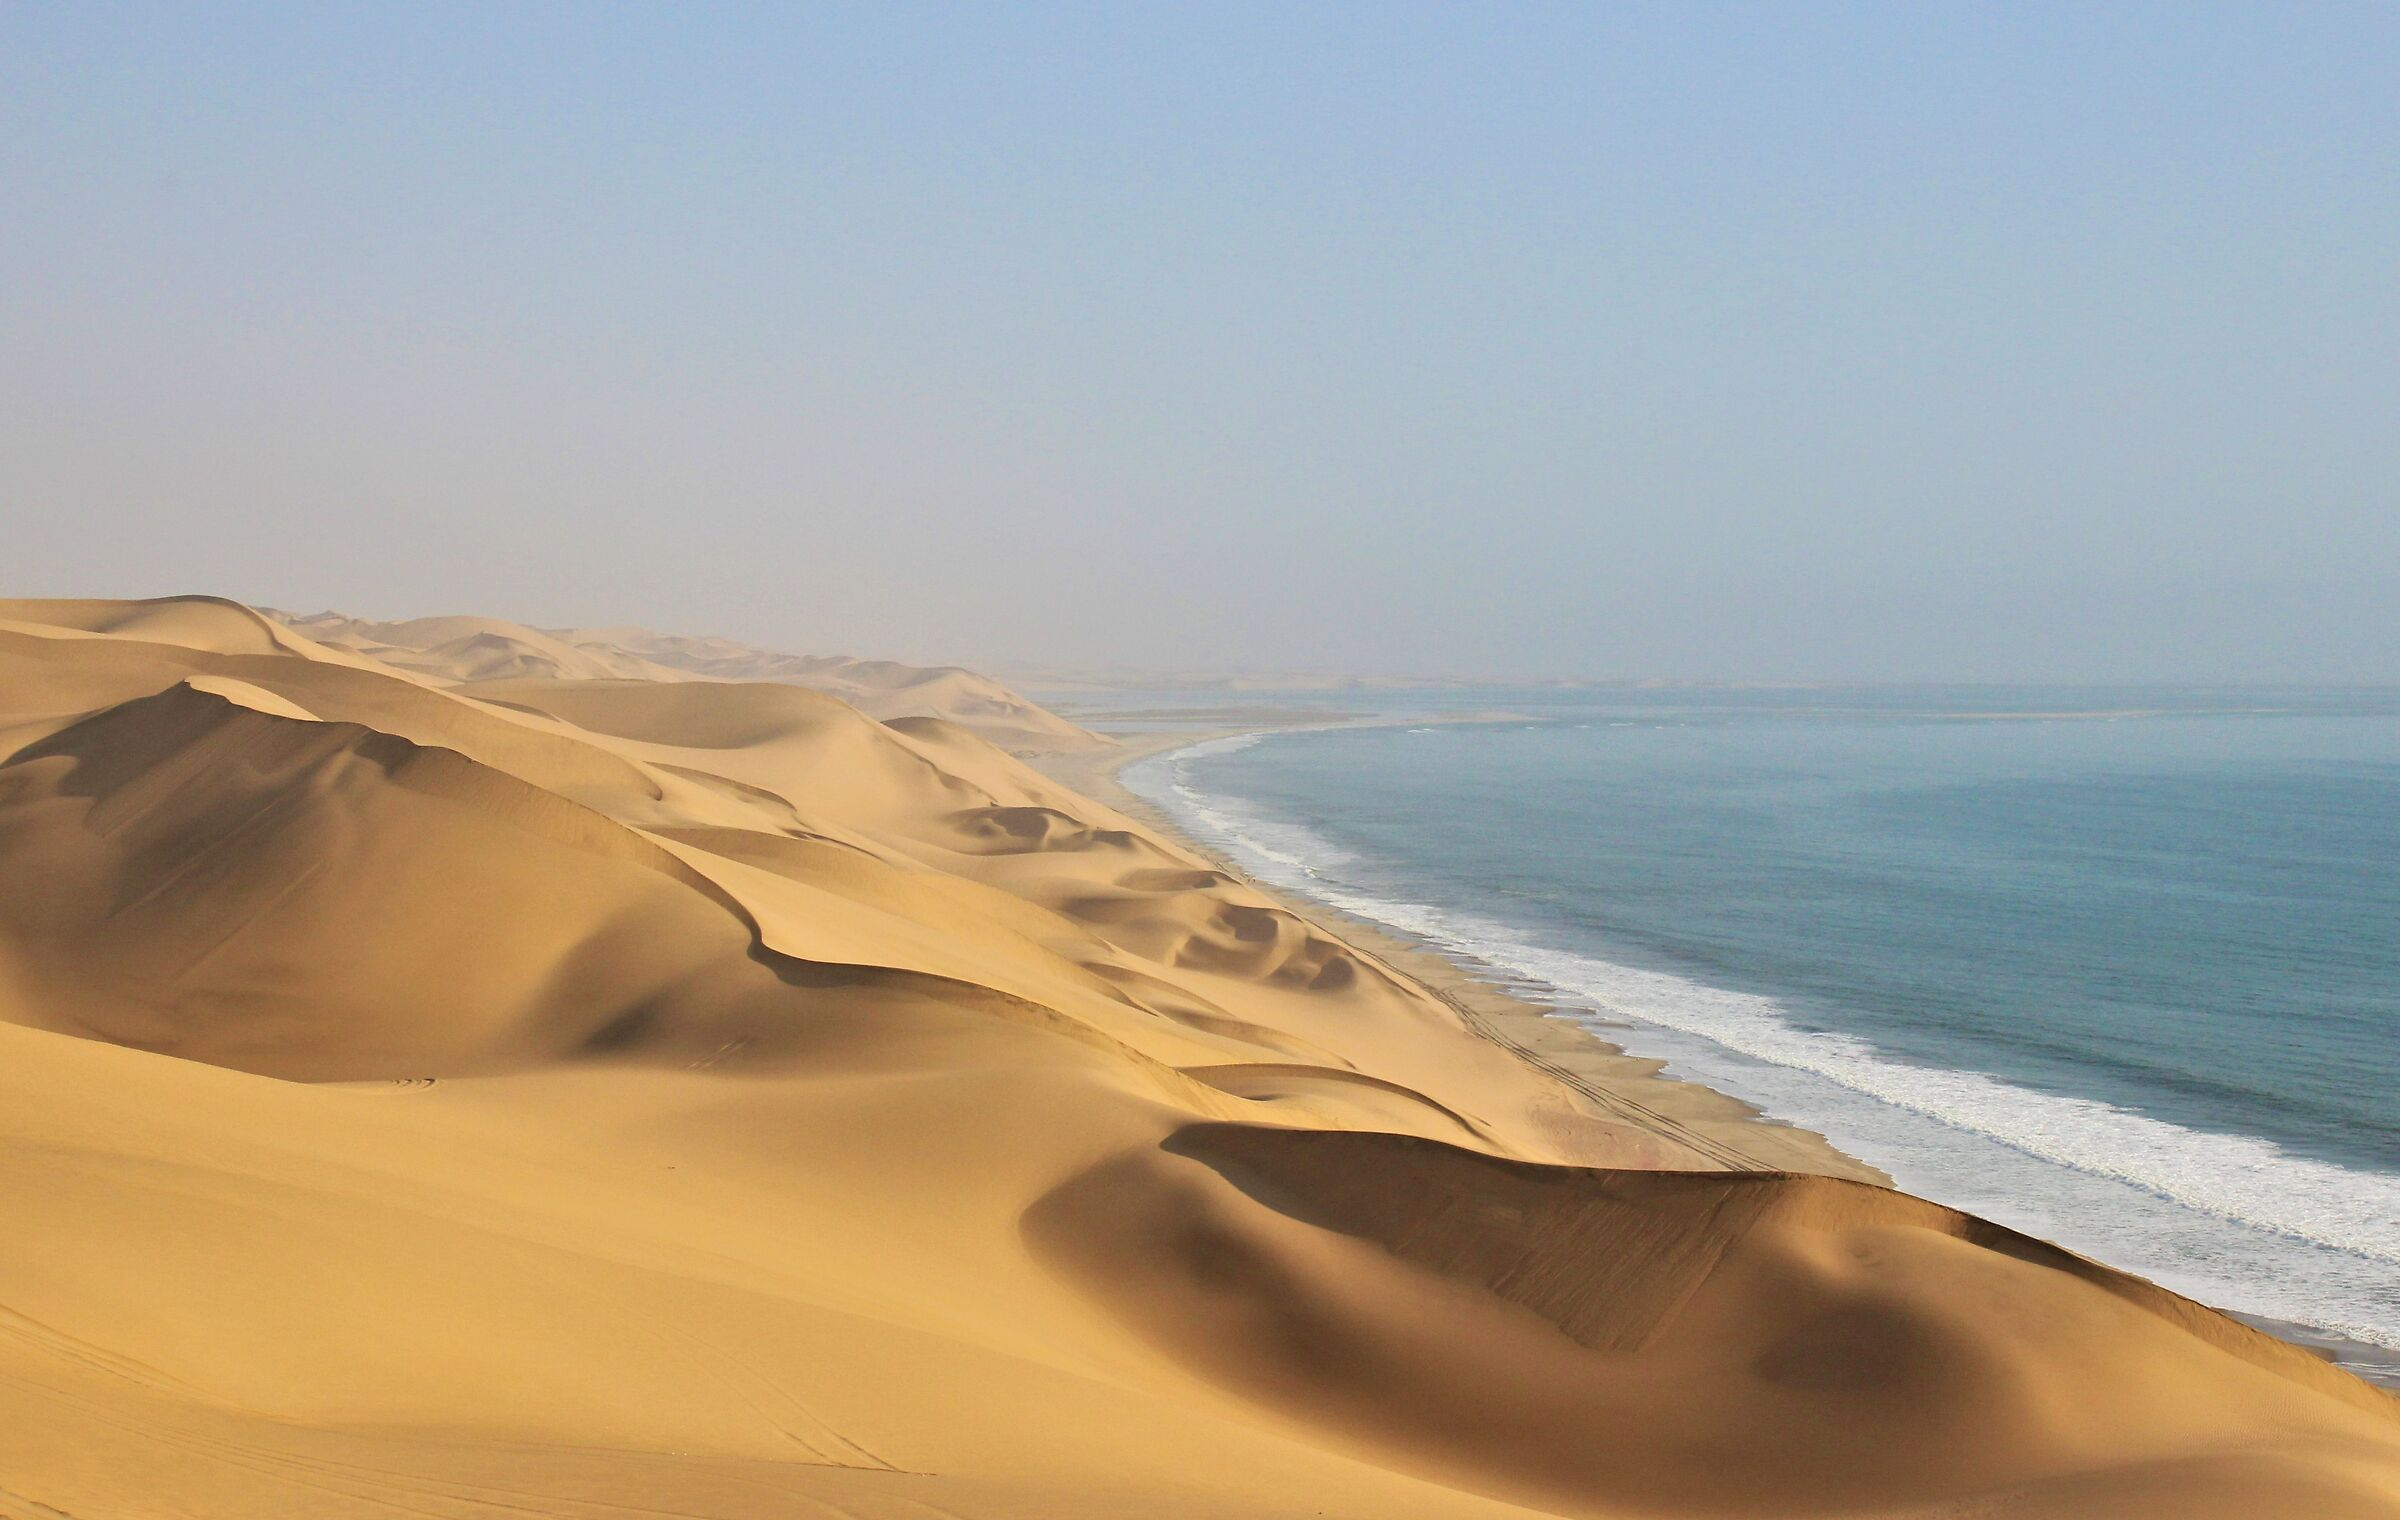 them where the desert embraces the ocean...